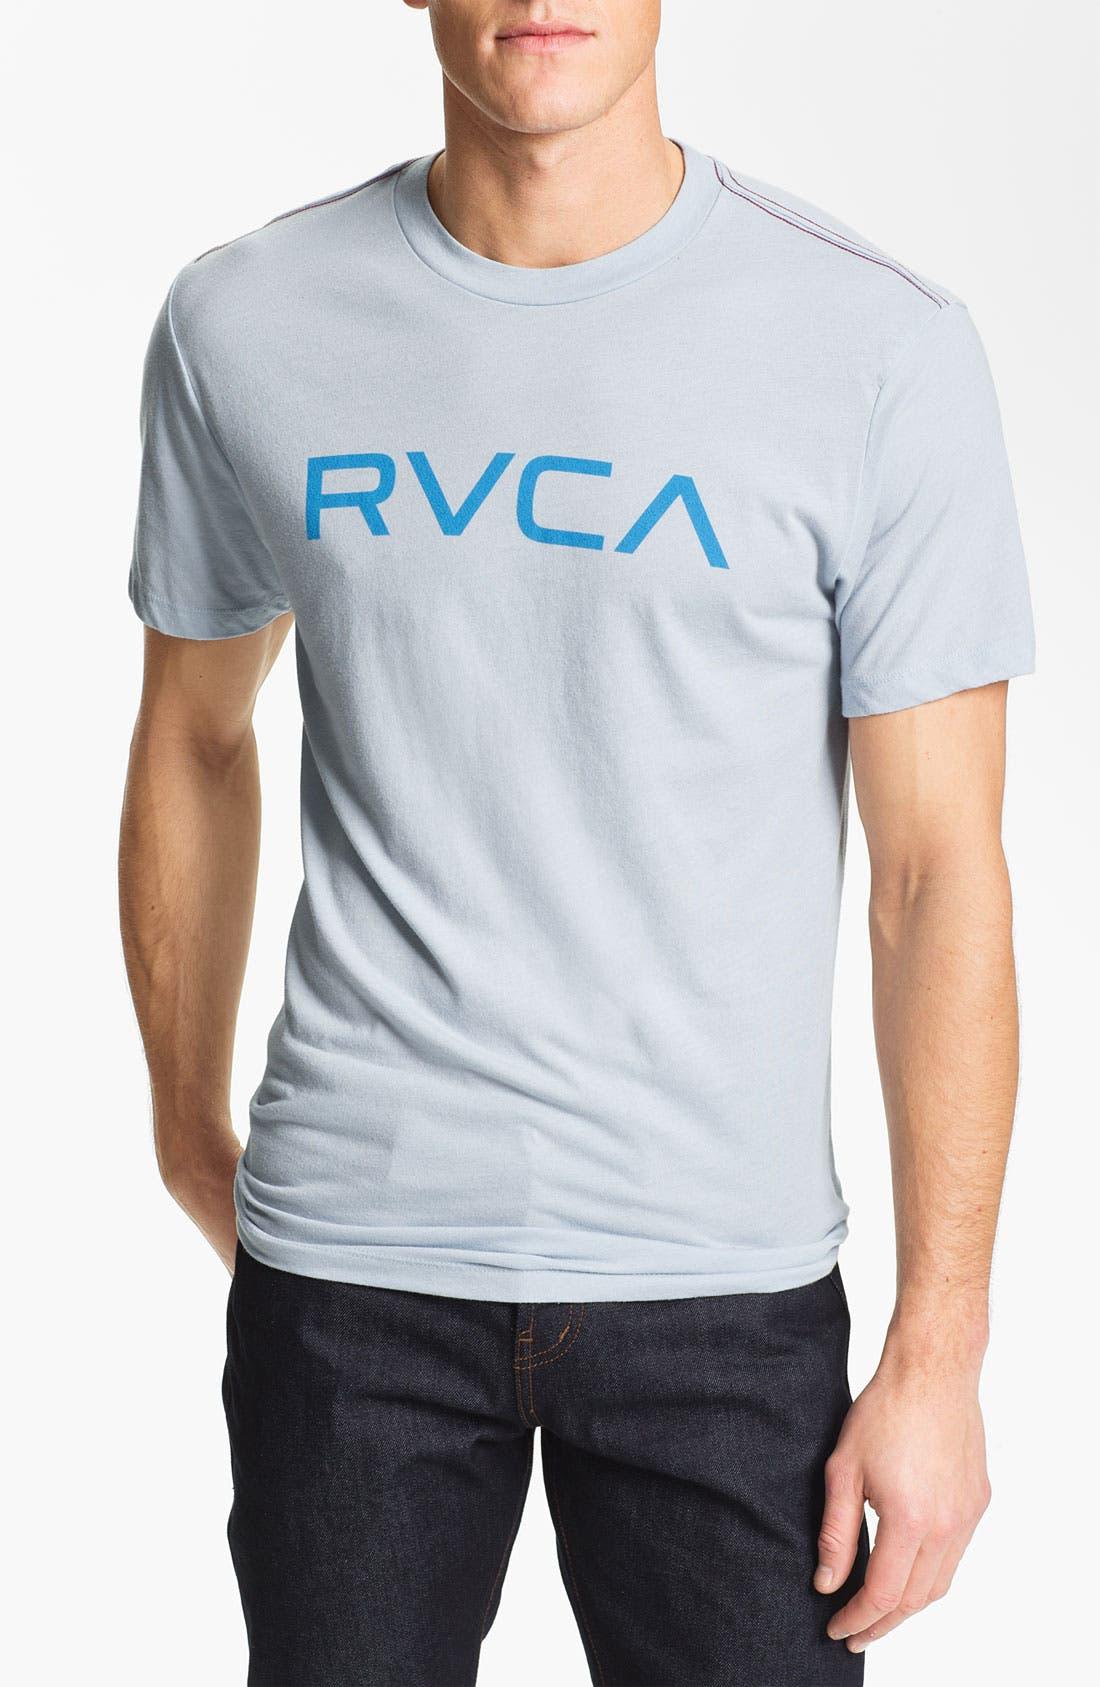 Alternate Image 1 Selected - RVCA 'Big RVCA Logo' T-Shirt